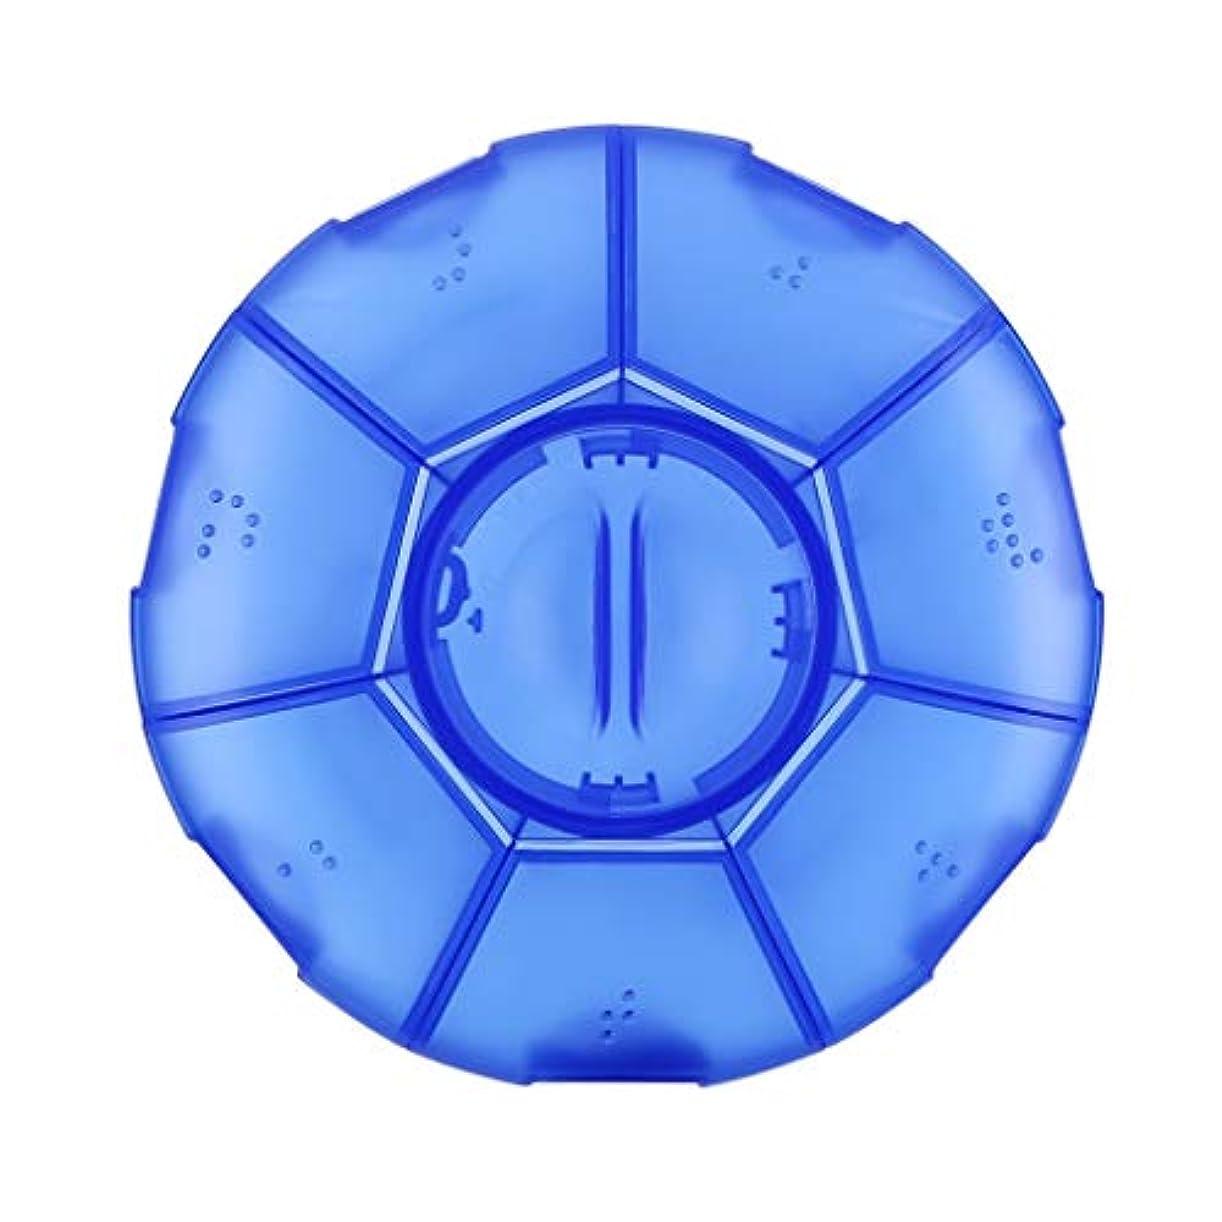 WXYXG 小型薬箱携帯用1週間の貯蔵そして小型薬の薬箱が付いている薬箱の貯蔵は丸薬箱を密封しました (Color : Blue, Size : 12.5cm×12.4cm×2.9cm)